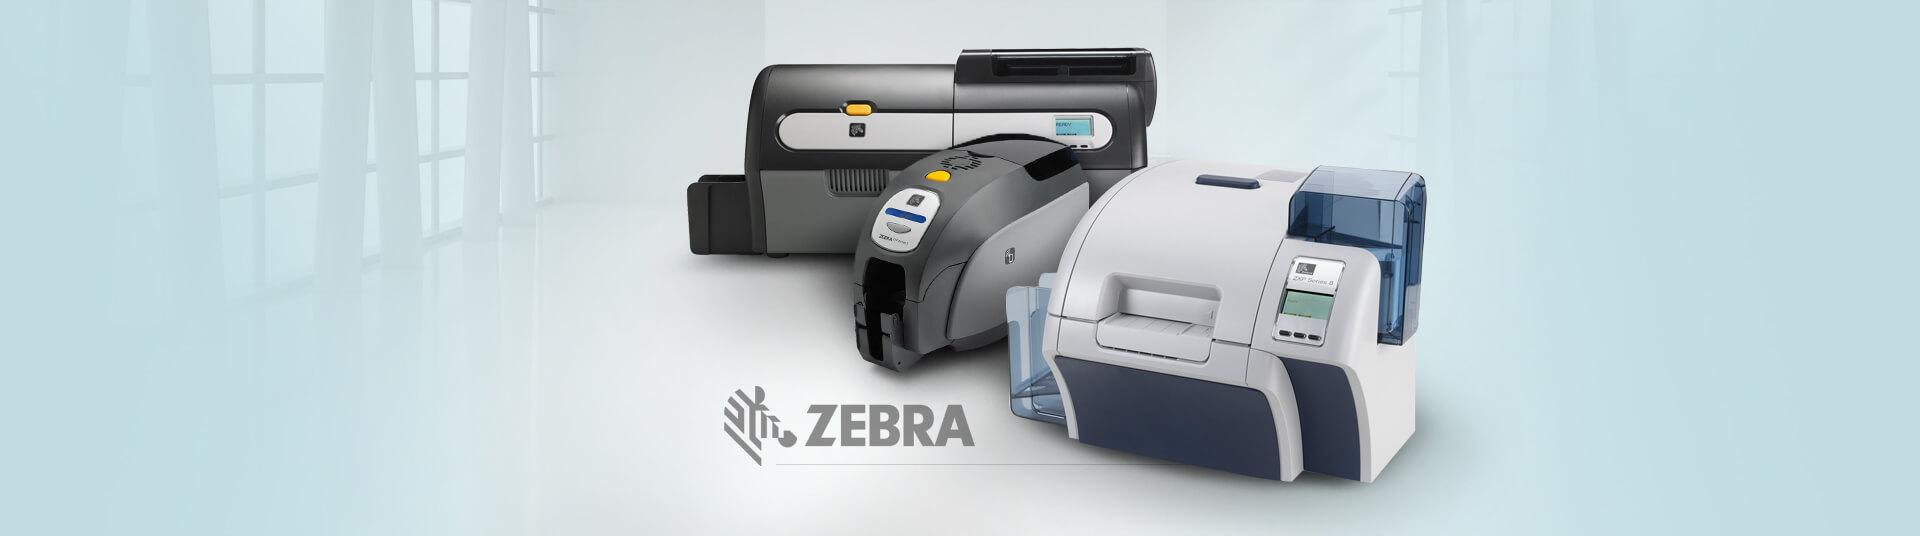 Zebra Photo ID Machine